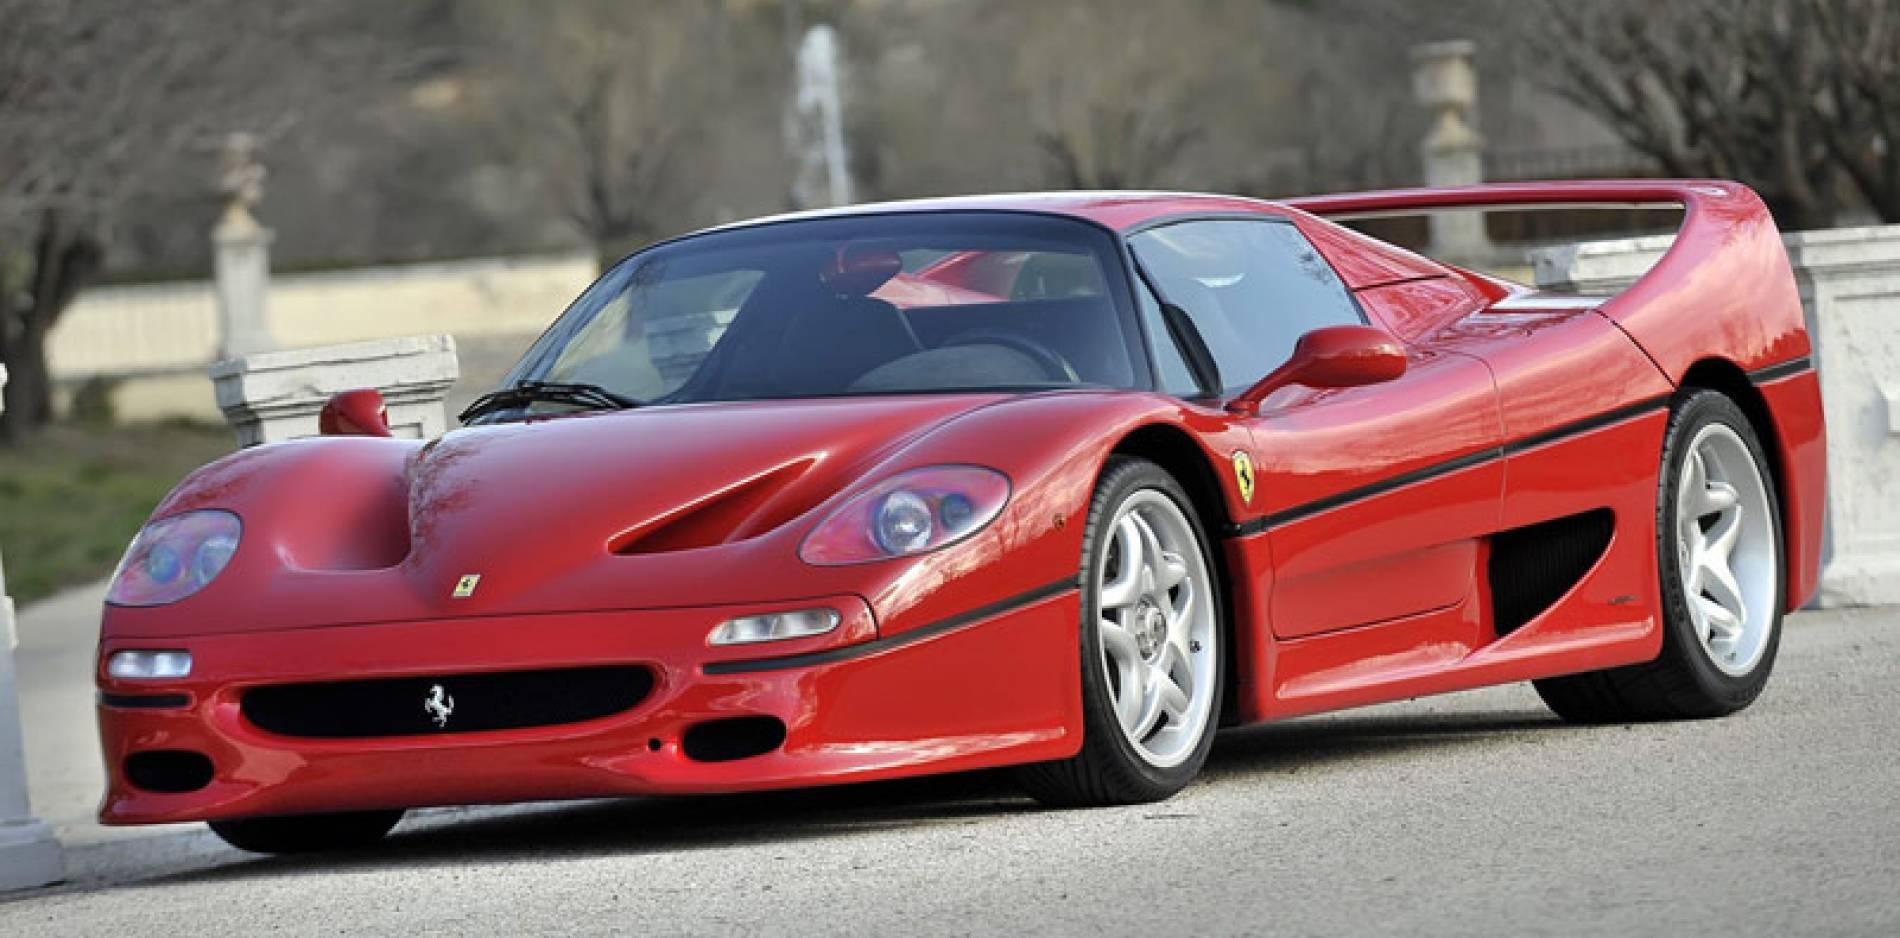 Prueba: Ferrari F50, el superdeportivo que no pudo reinar